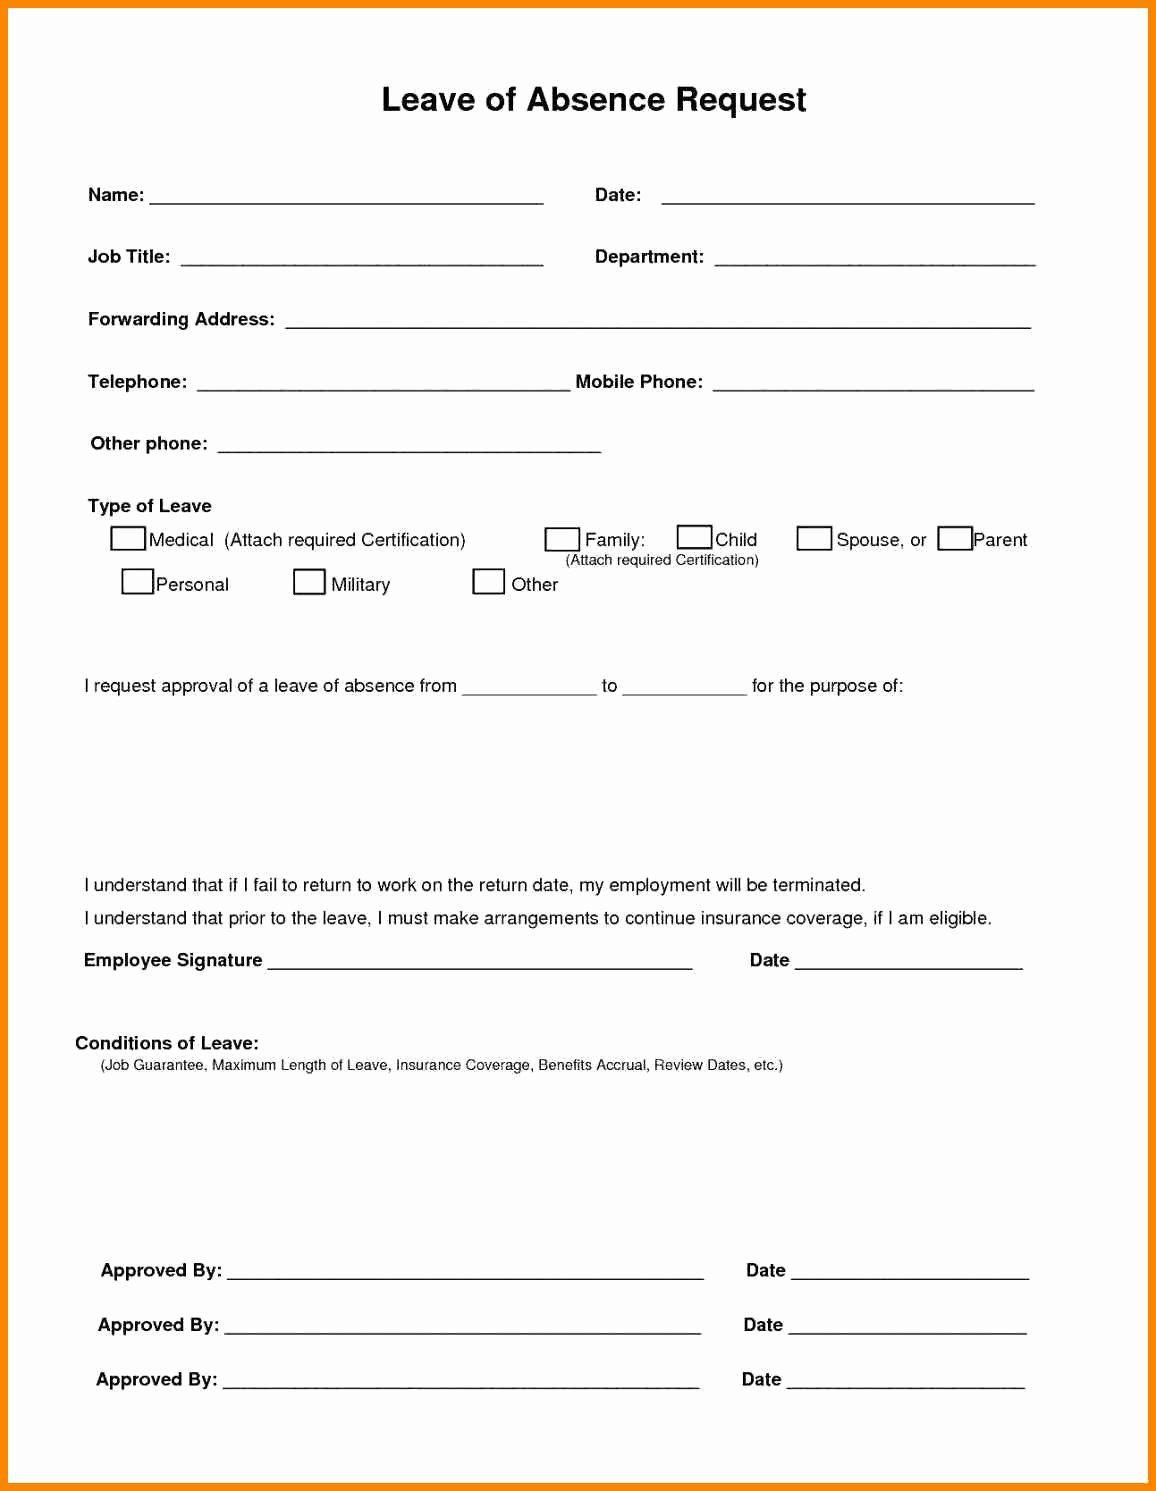 Sick Leave form Template Elegant Employee Sick Leave form Template ...